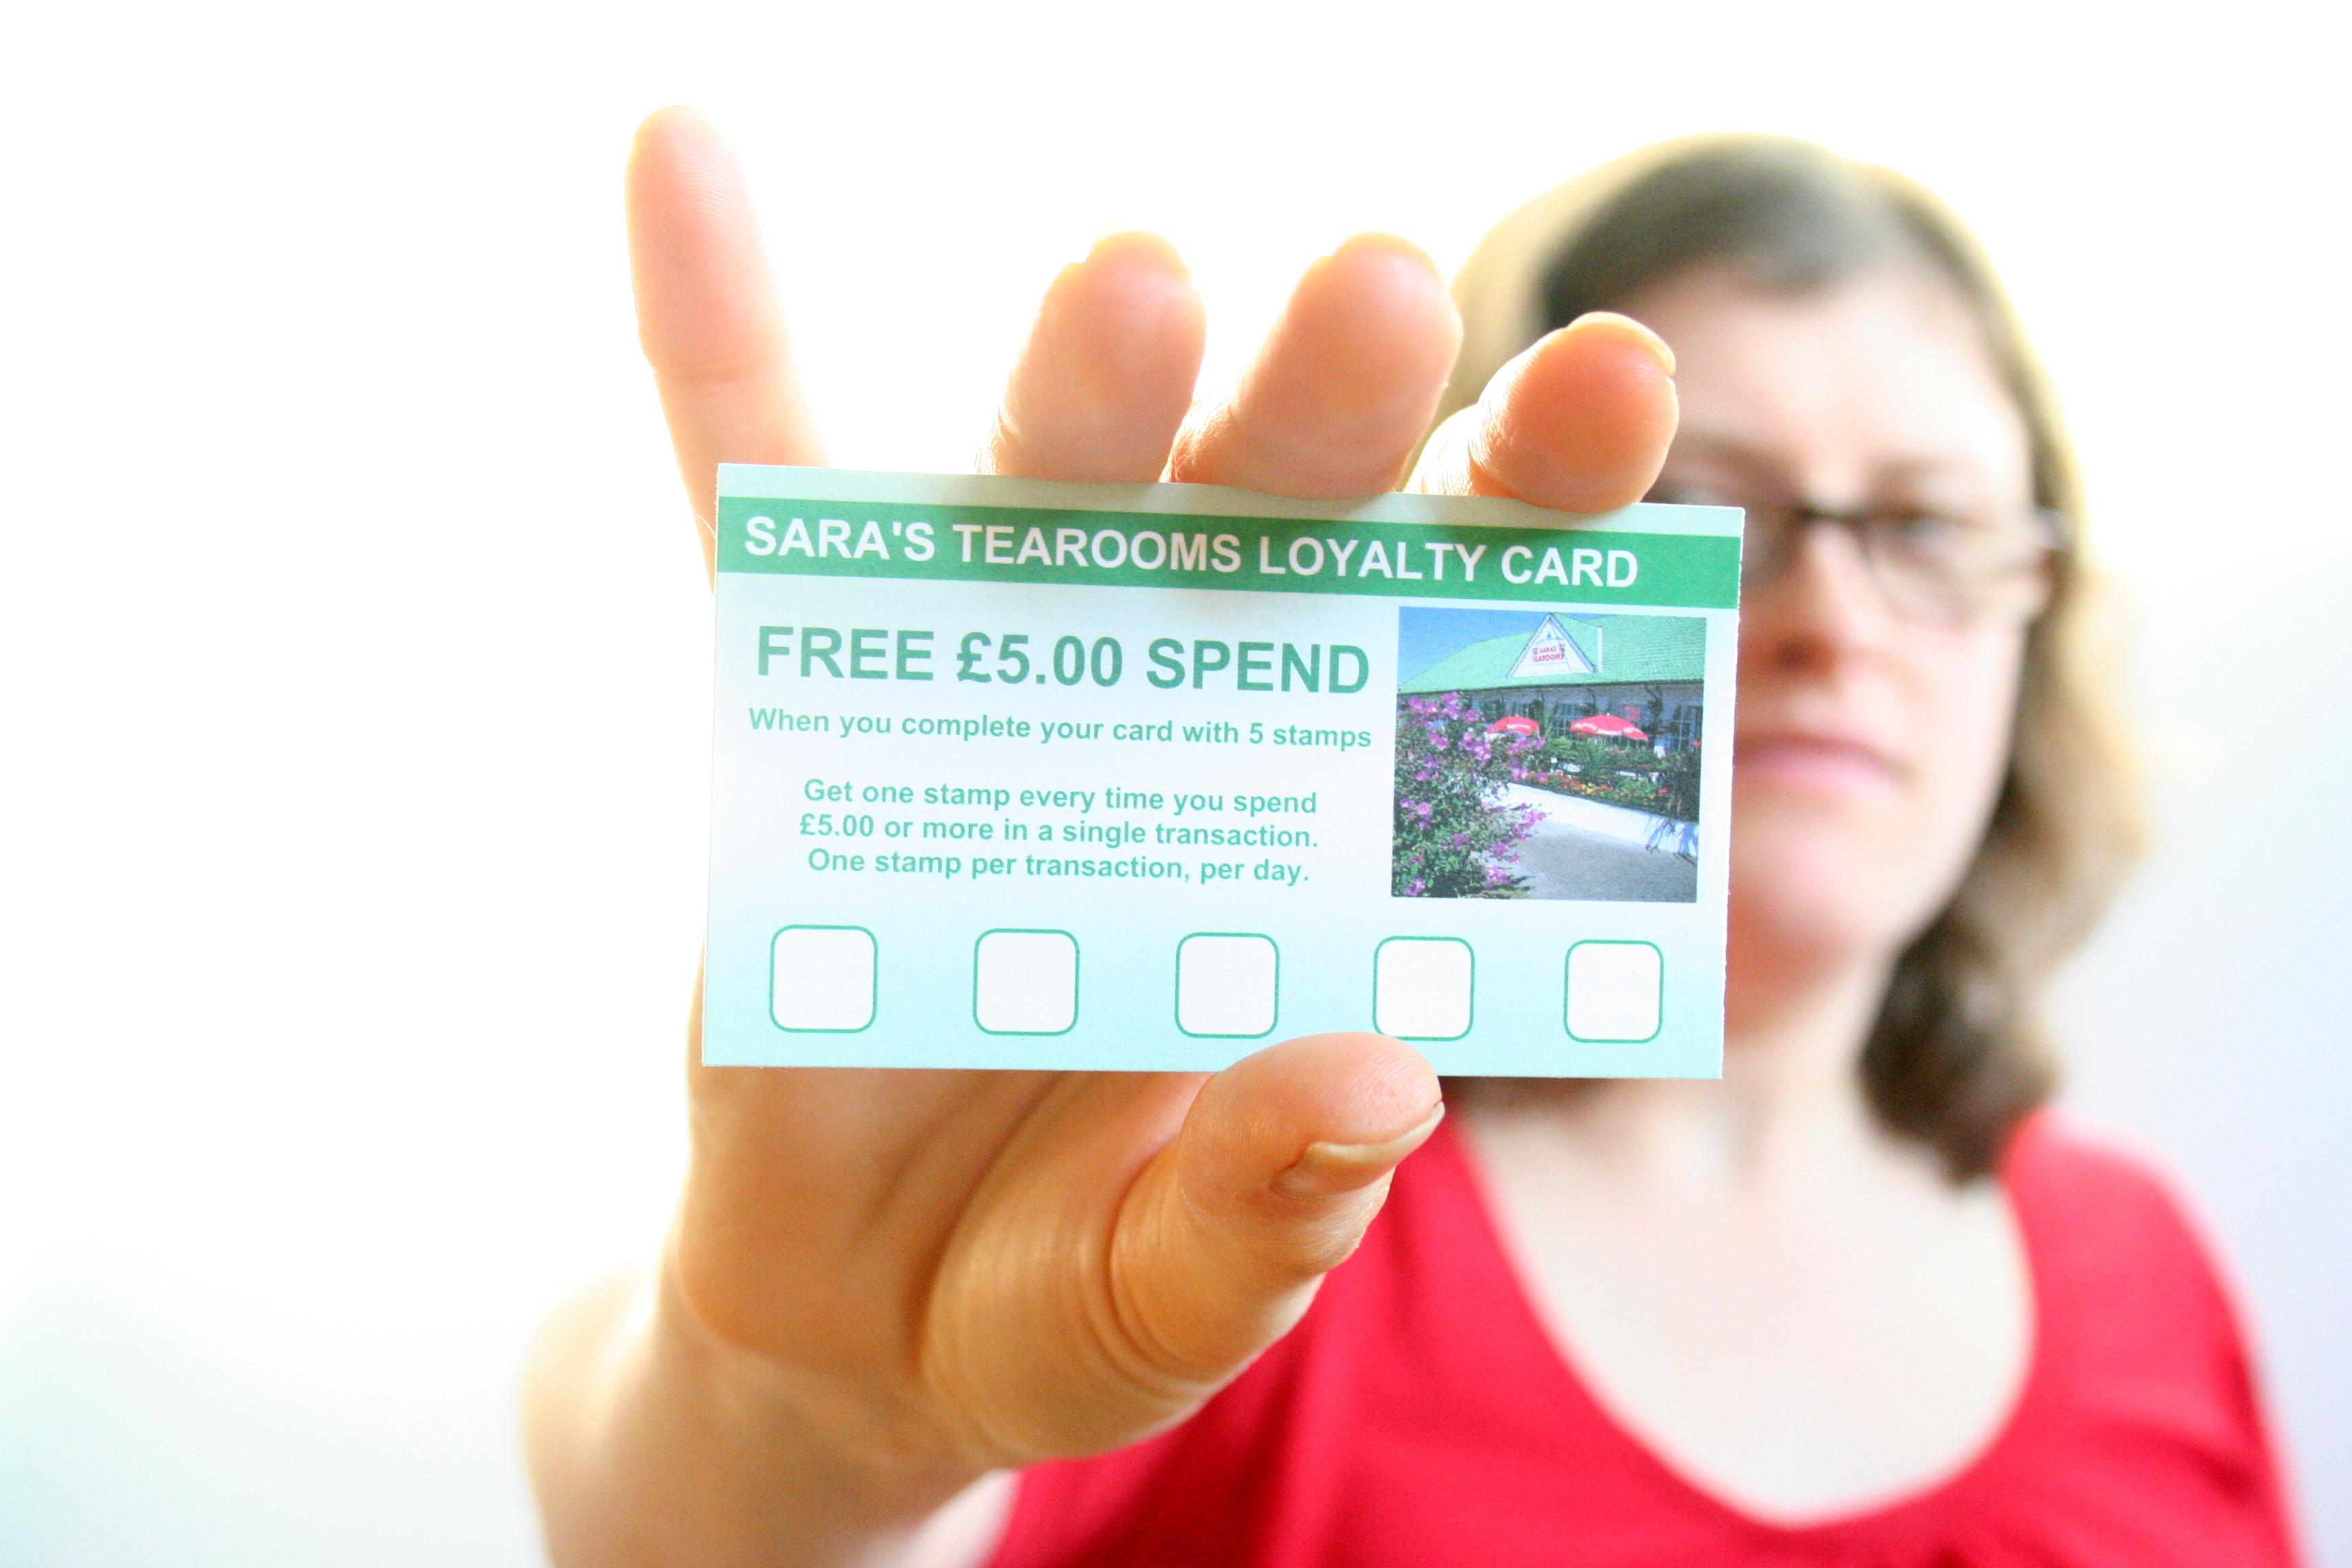 Sara's Tearooms Loyalty Card